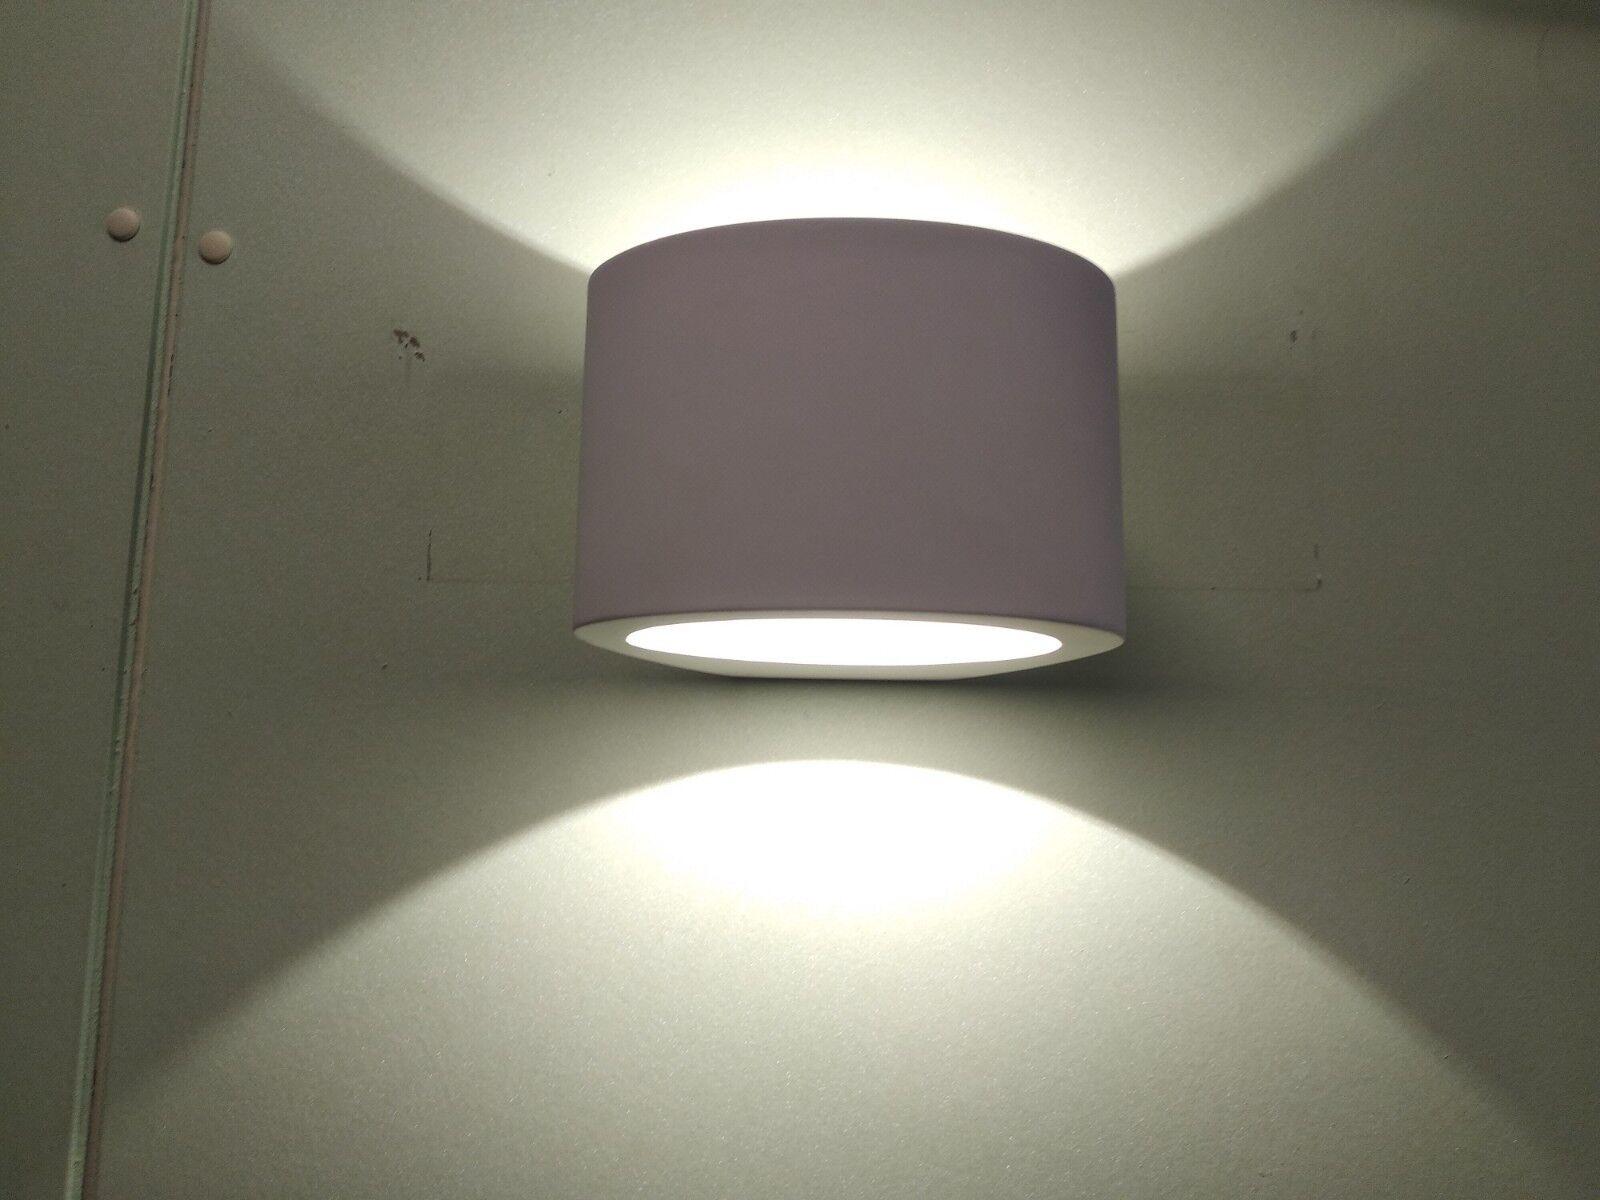 Applique con tubi idraulici lampada vintage da terra con tubi